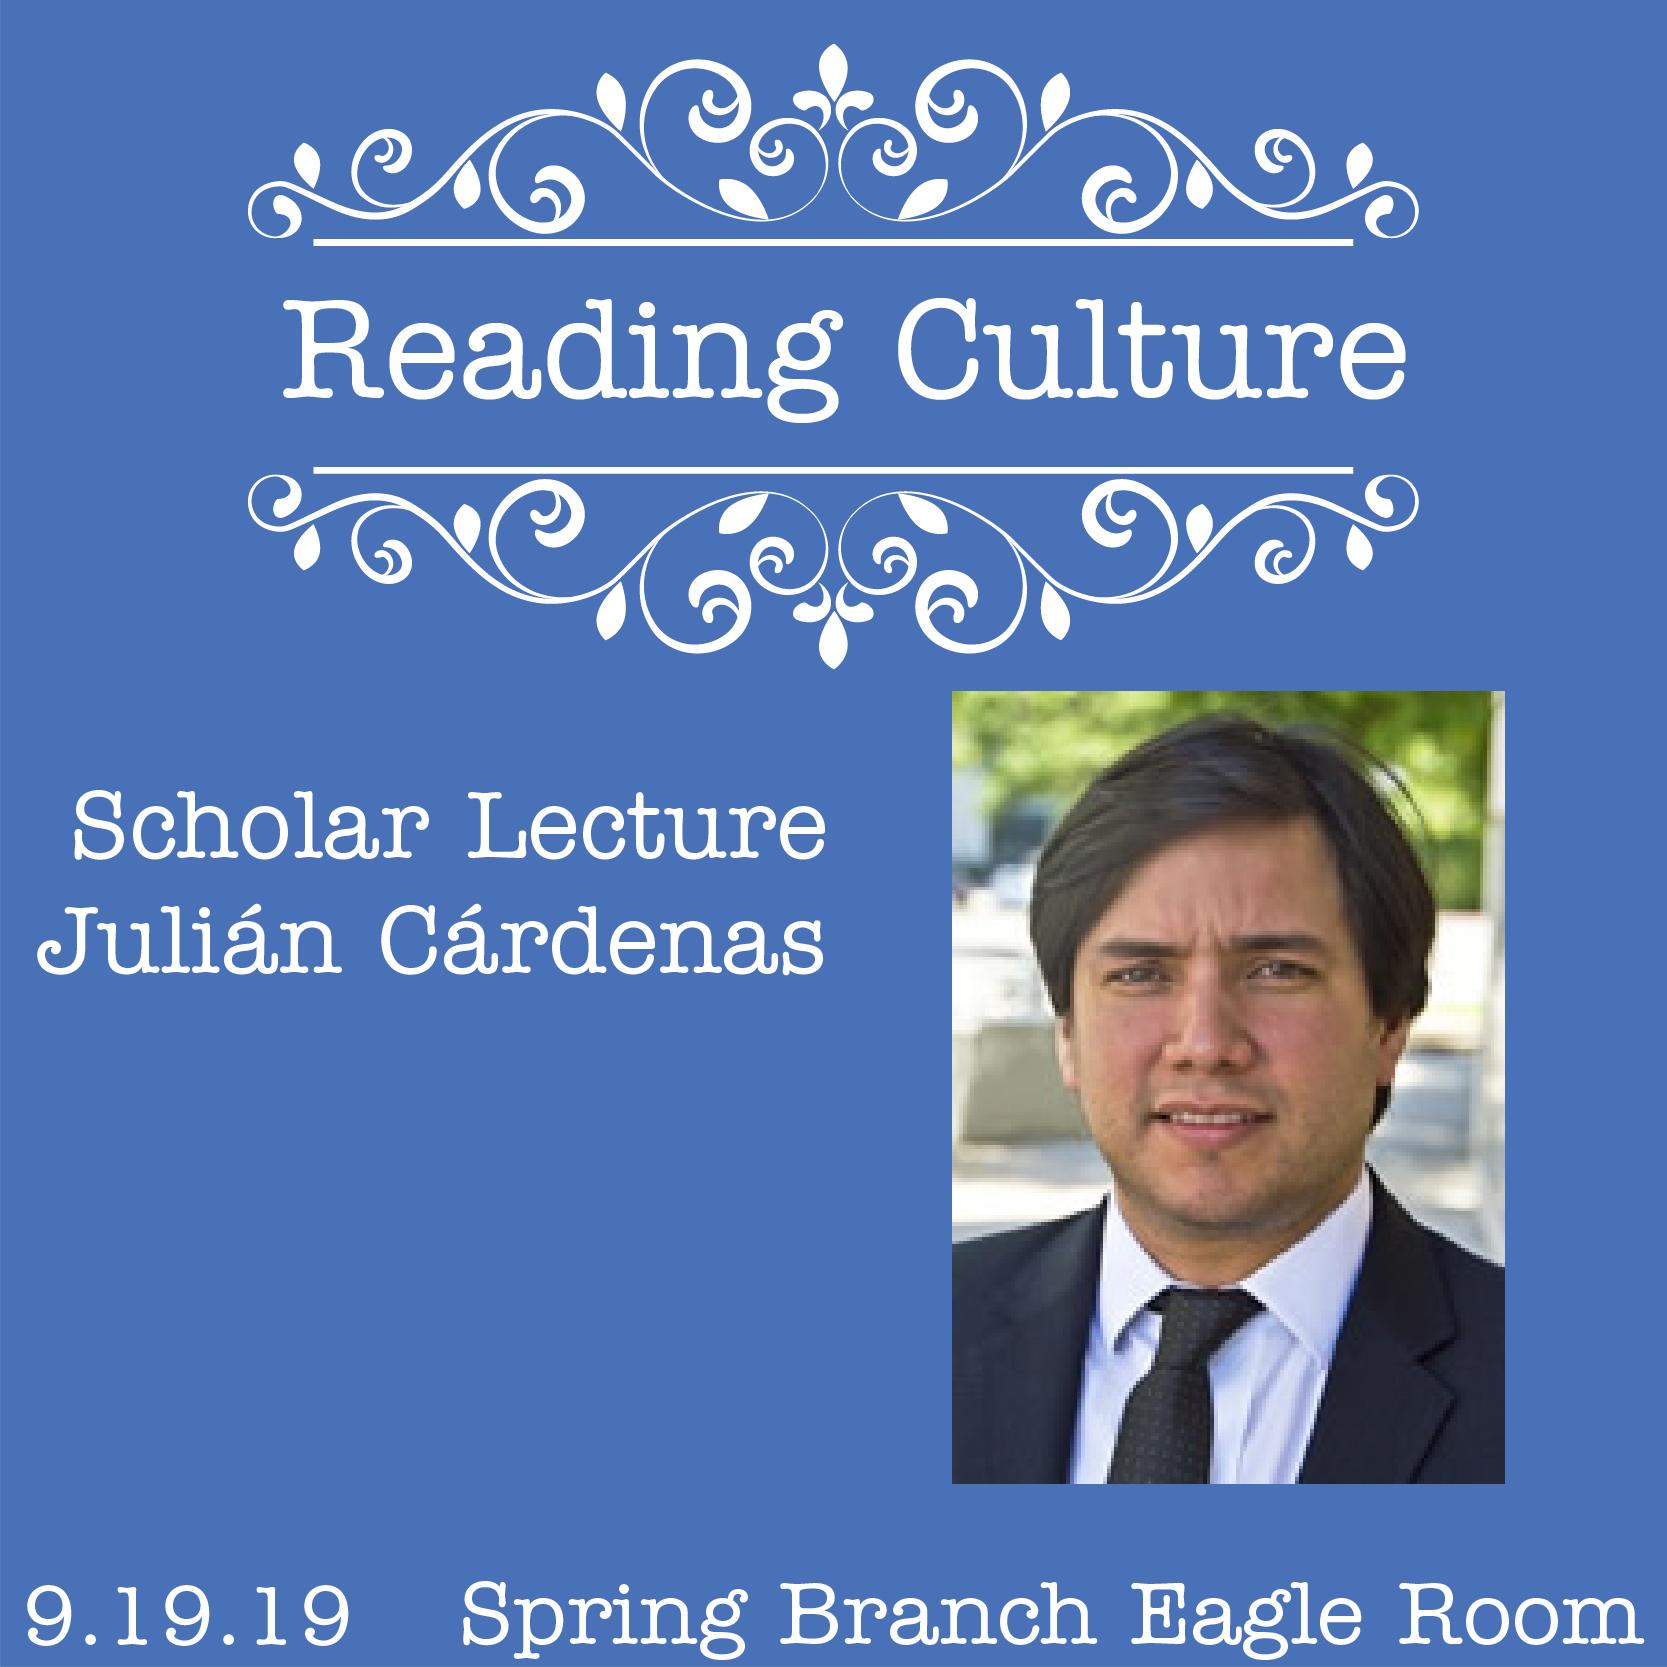 Reading Culture: Scholar Lecture with Julián Cárdenas (Spring Branch) (Rescheduled)